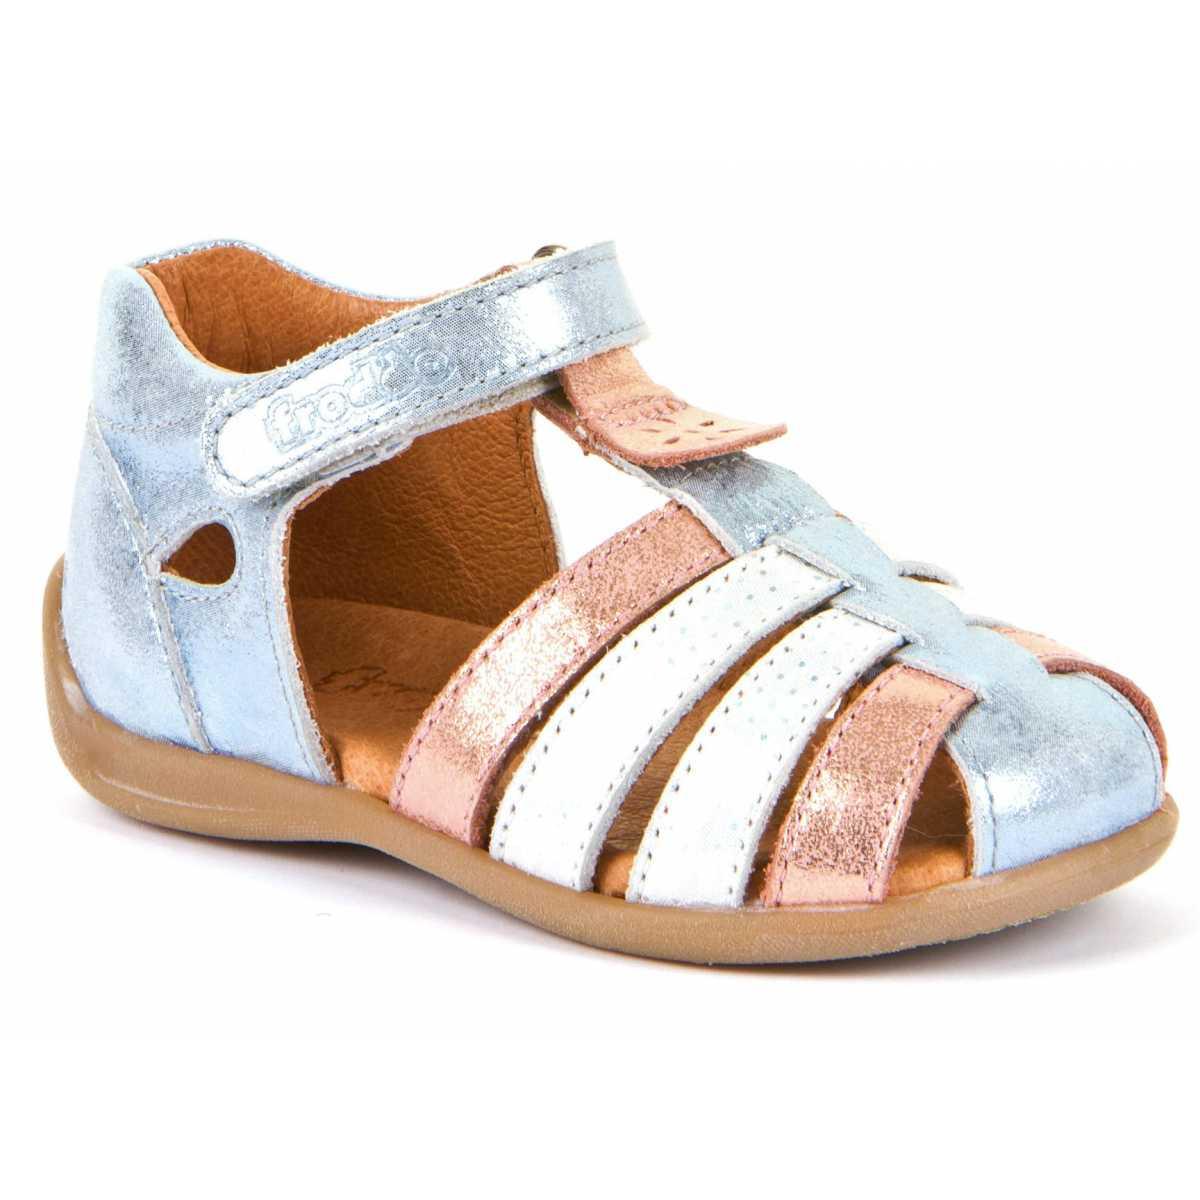 FRODDO Sandals G2150132-4